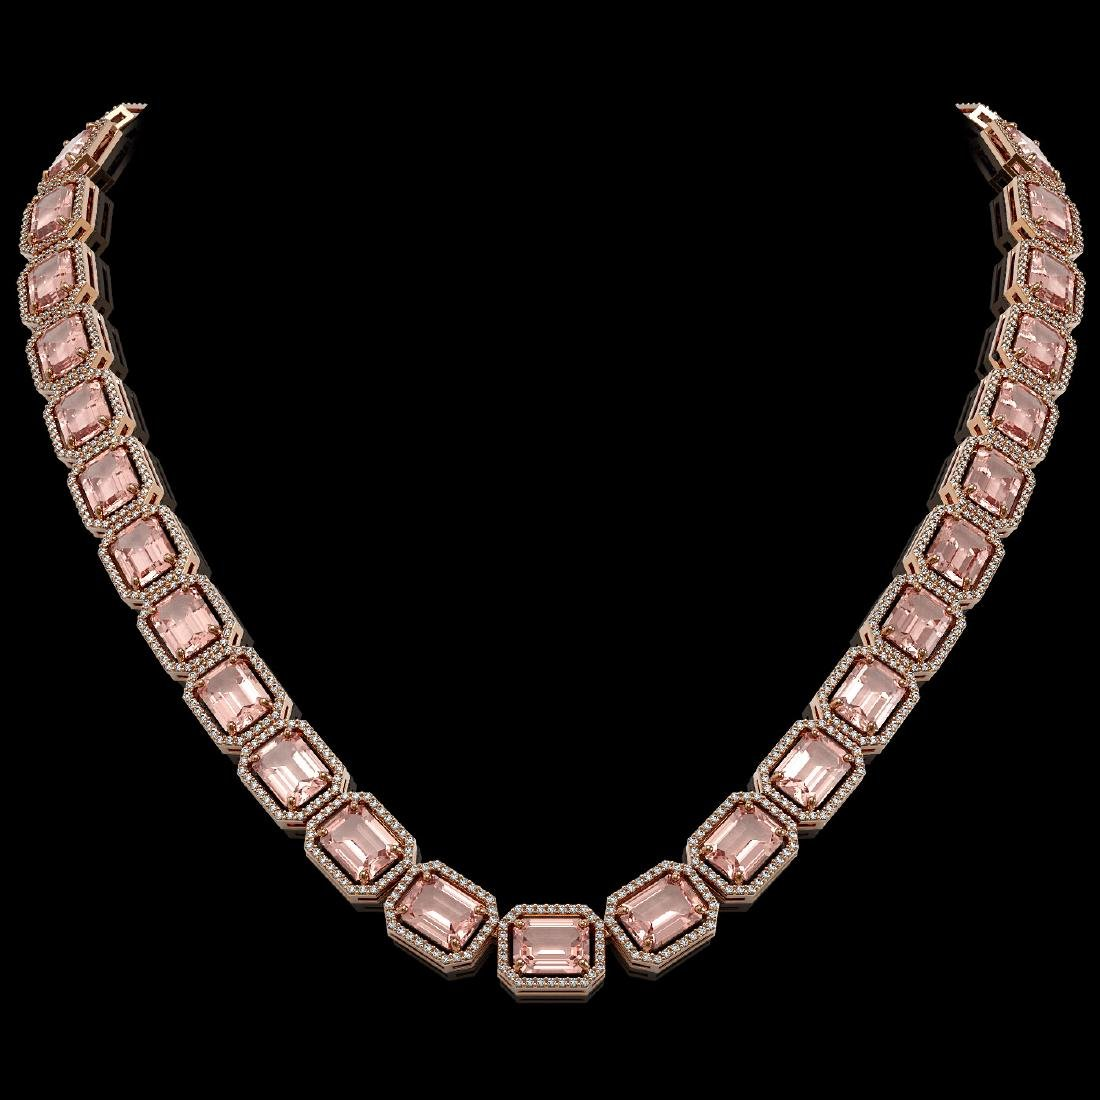 81.64 CTW Morganite & Diamond Halo Necklace 10K Rose